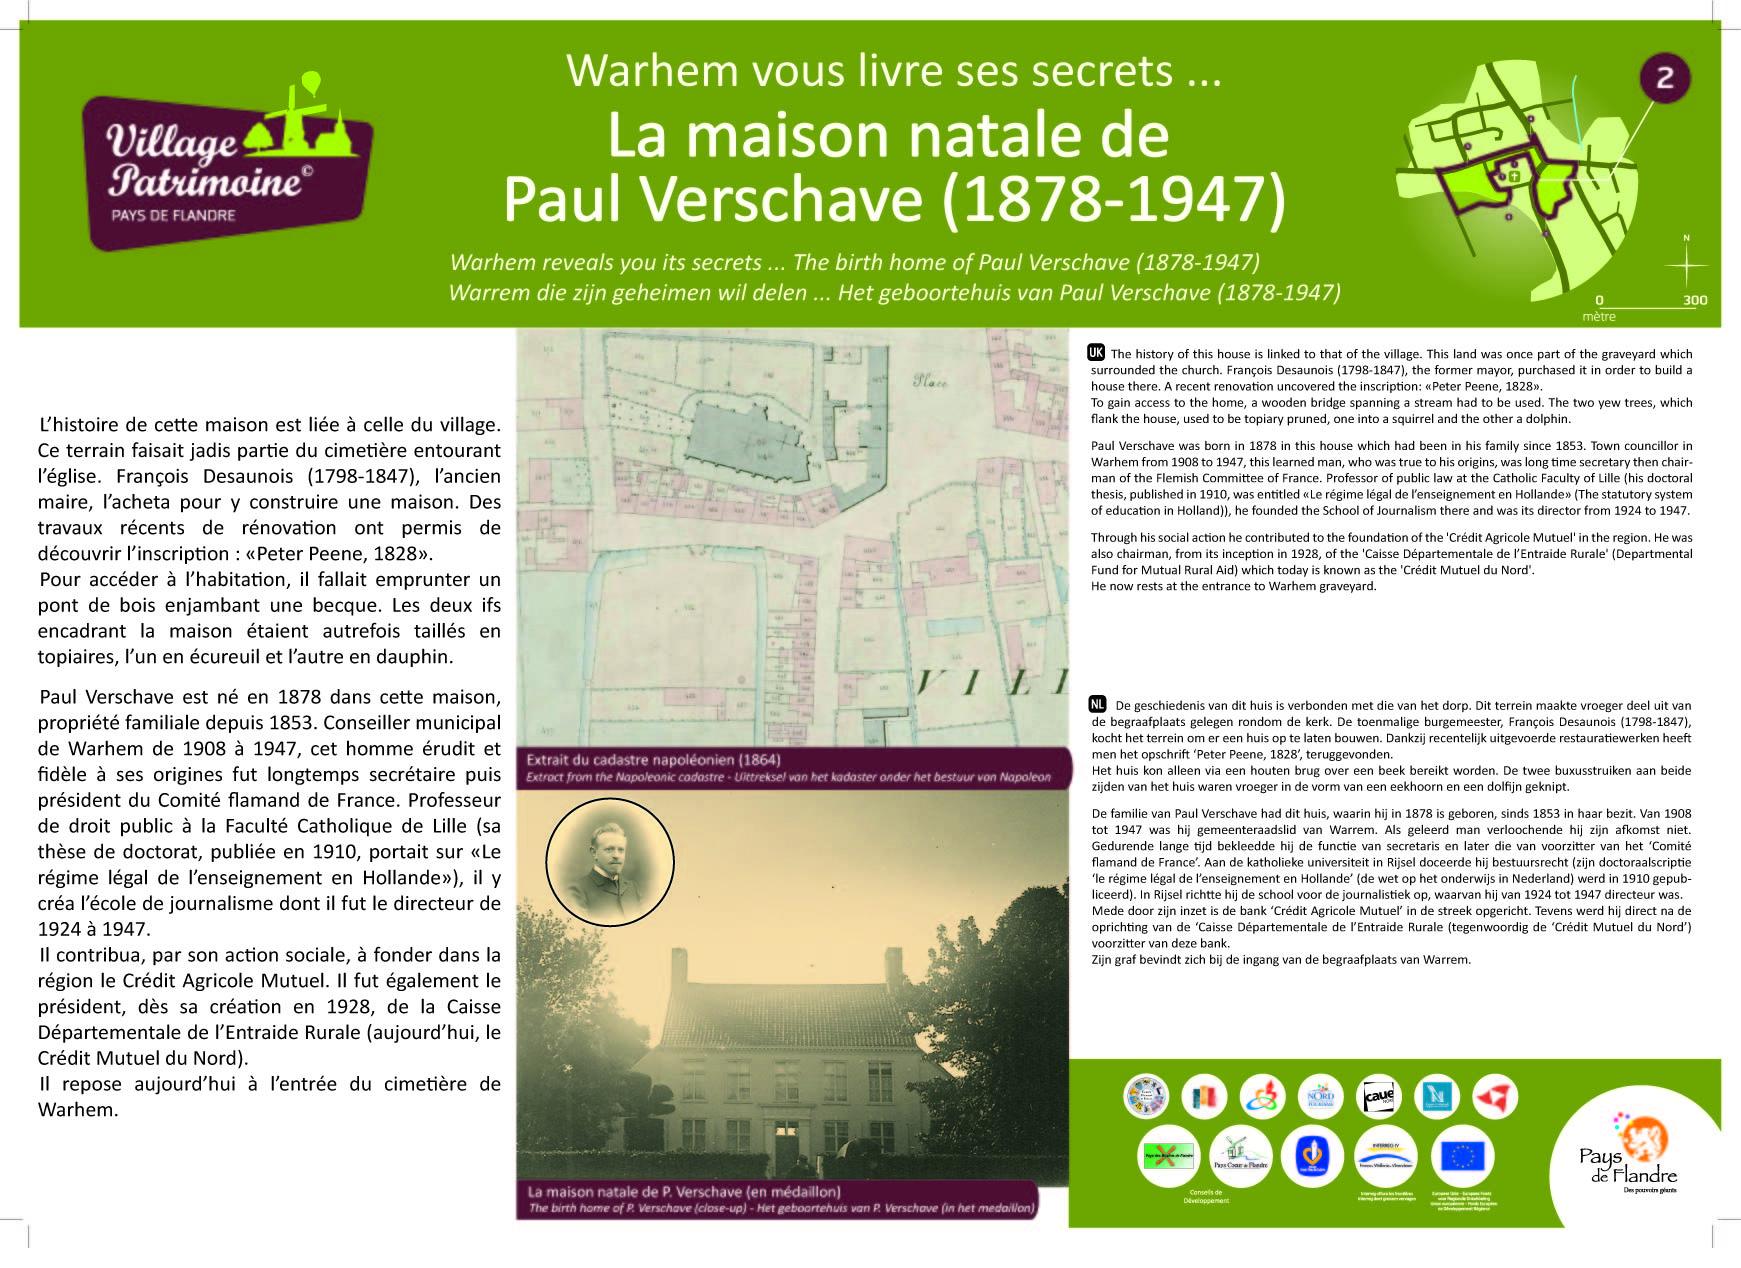 VP2_Maison_natale_Paul_Verschave.jpg